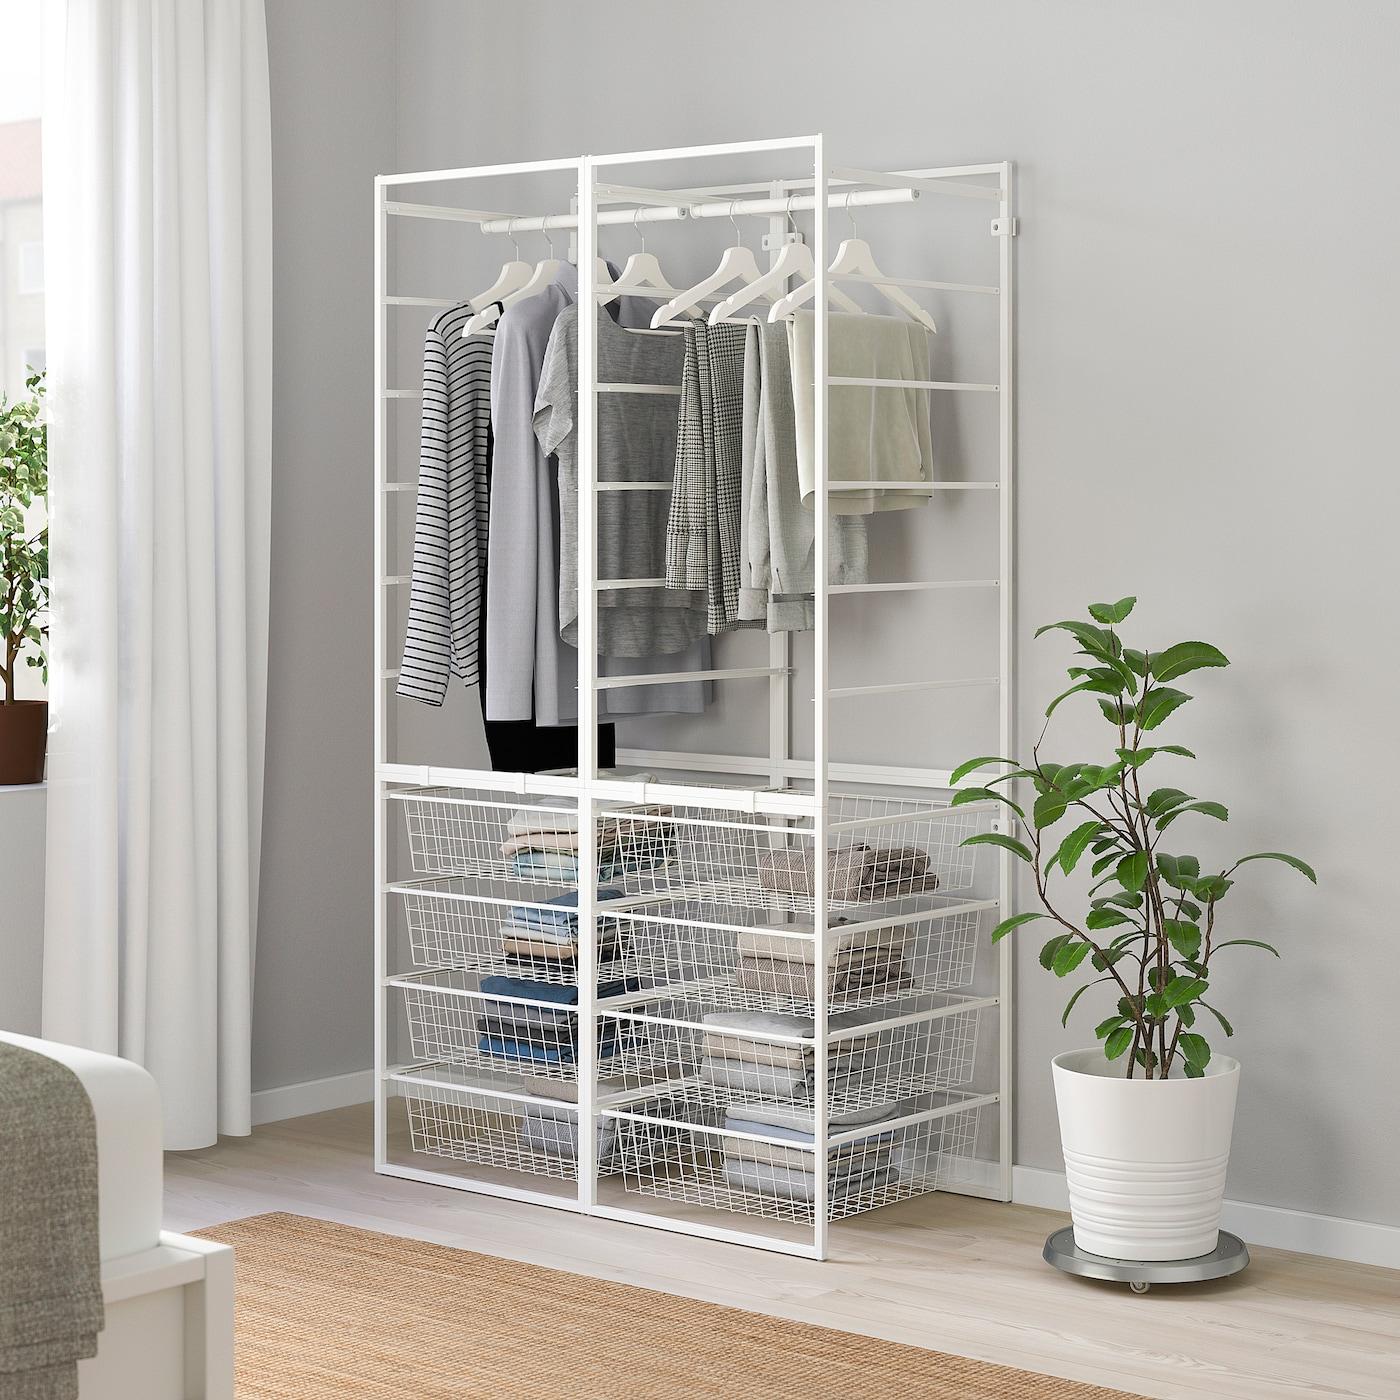 JONAXEL 尤纳赛尔 框架/网篮/挂衣杆, 白色, 99x51x173 厘米